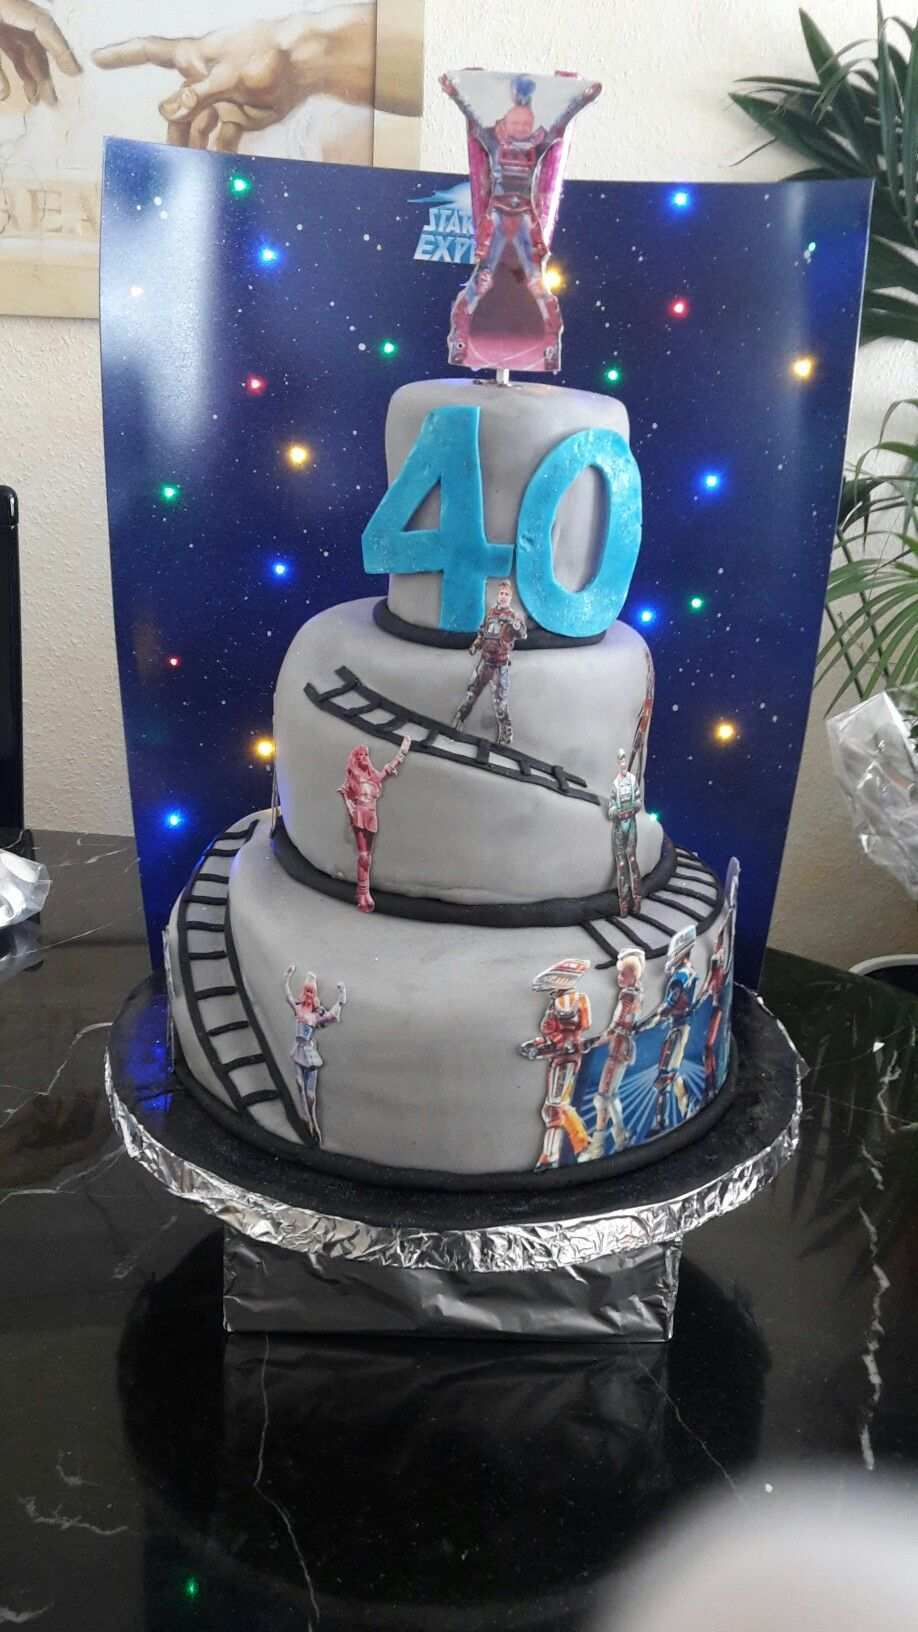 Starlight Express Torte Geburtstagstorte Geburtstagskuchen Backideen